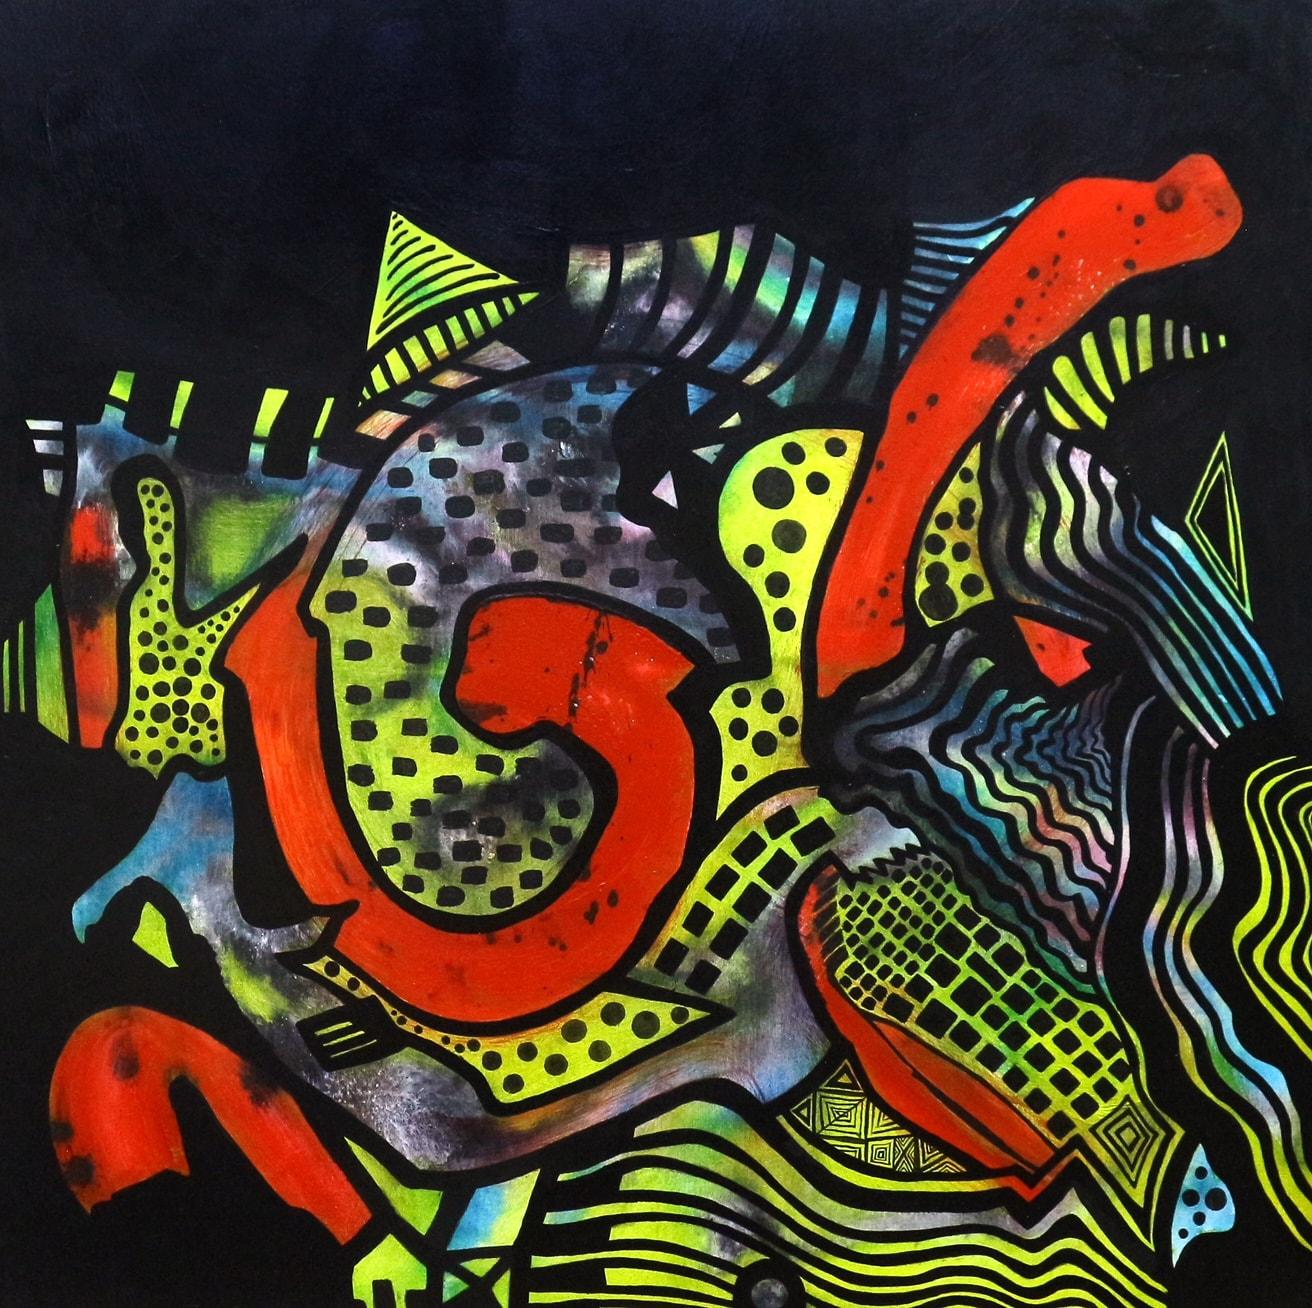 Dissimilar, 36 x 36 Inch, Acrylic on Canvas, AC-ZRK-005